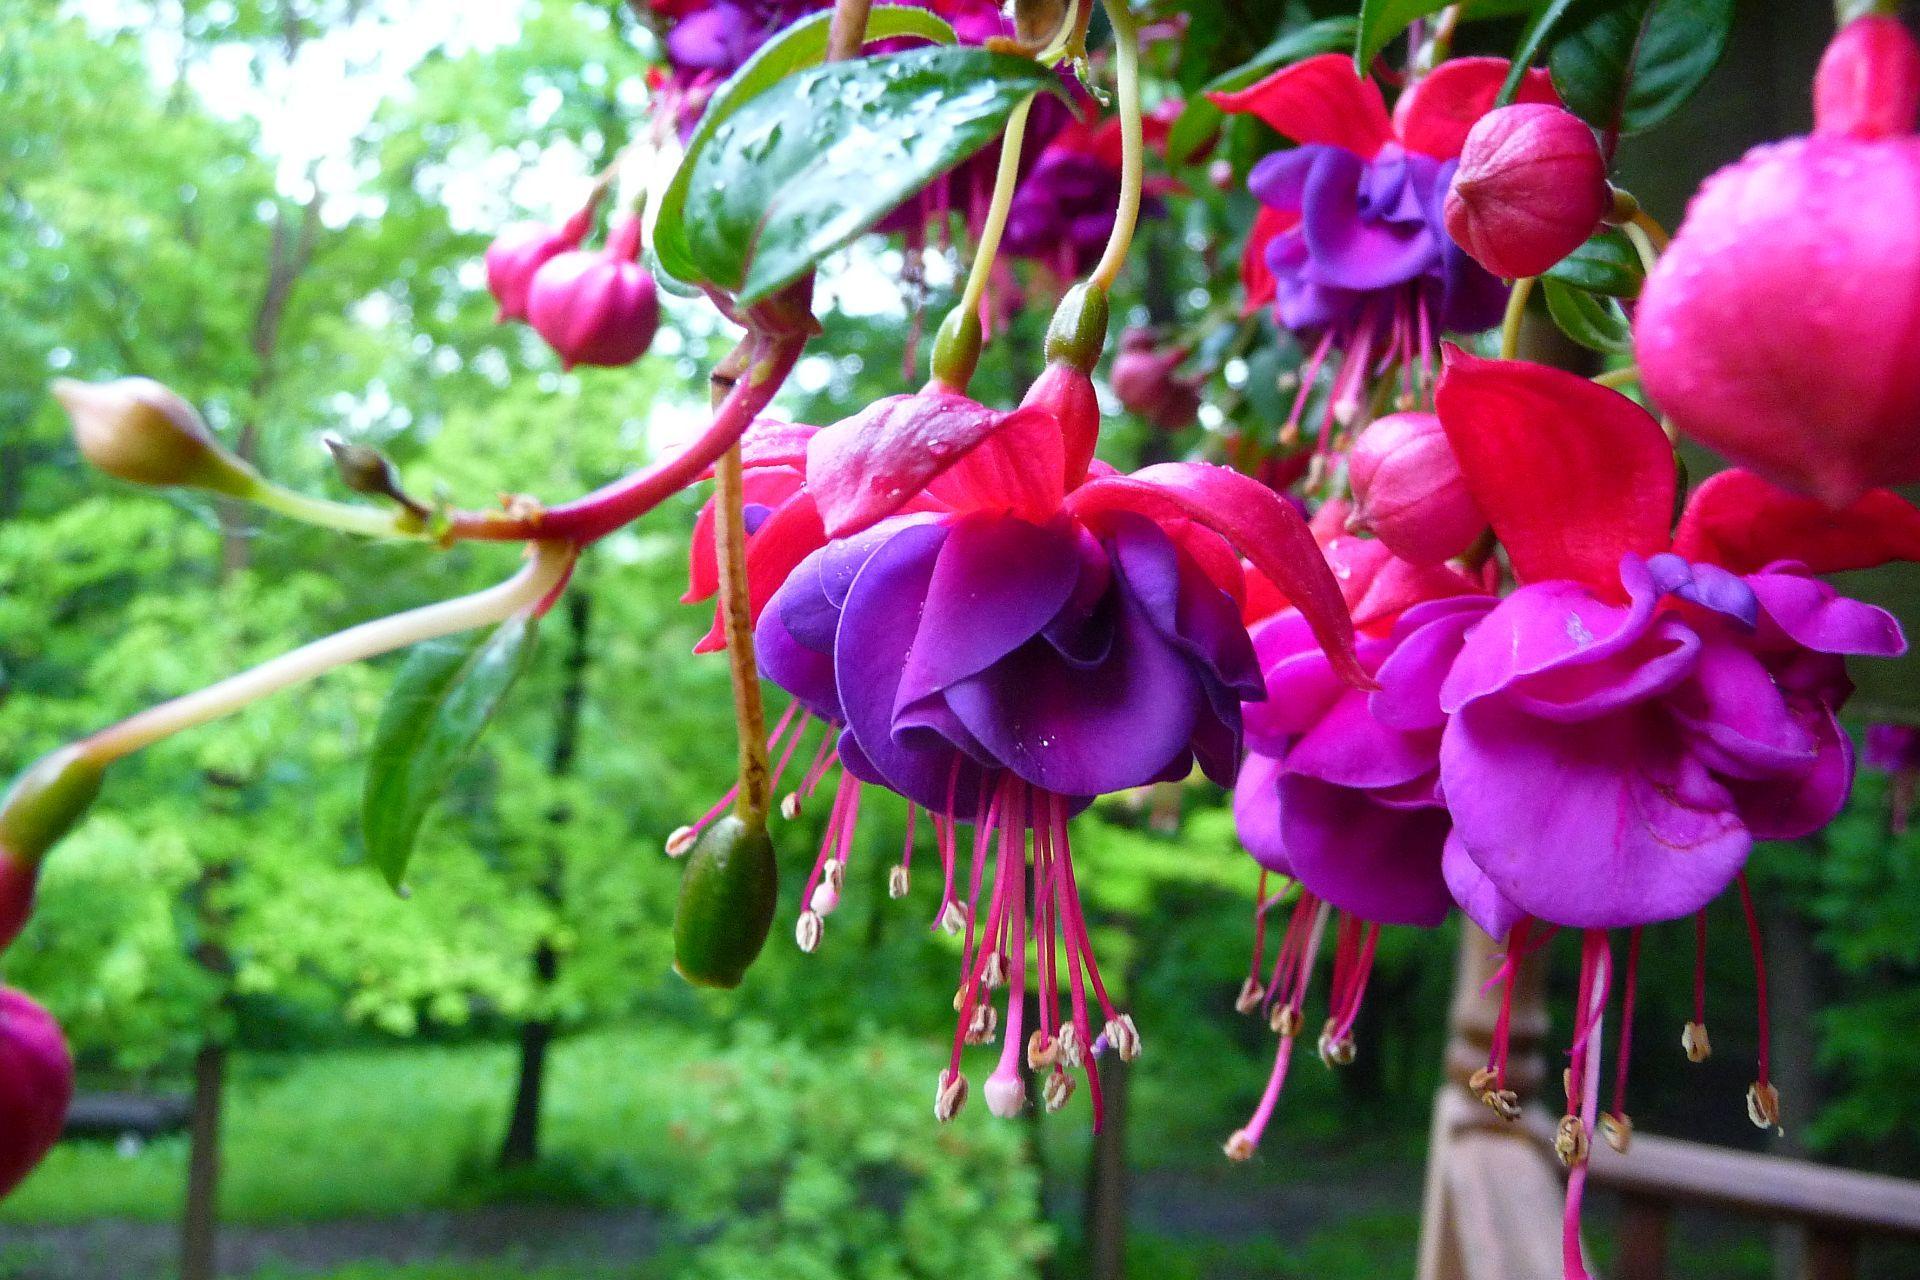 Peonies Changing Colors Fuchsia Plant Impatiens Flowers Fuchsia Flower